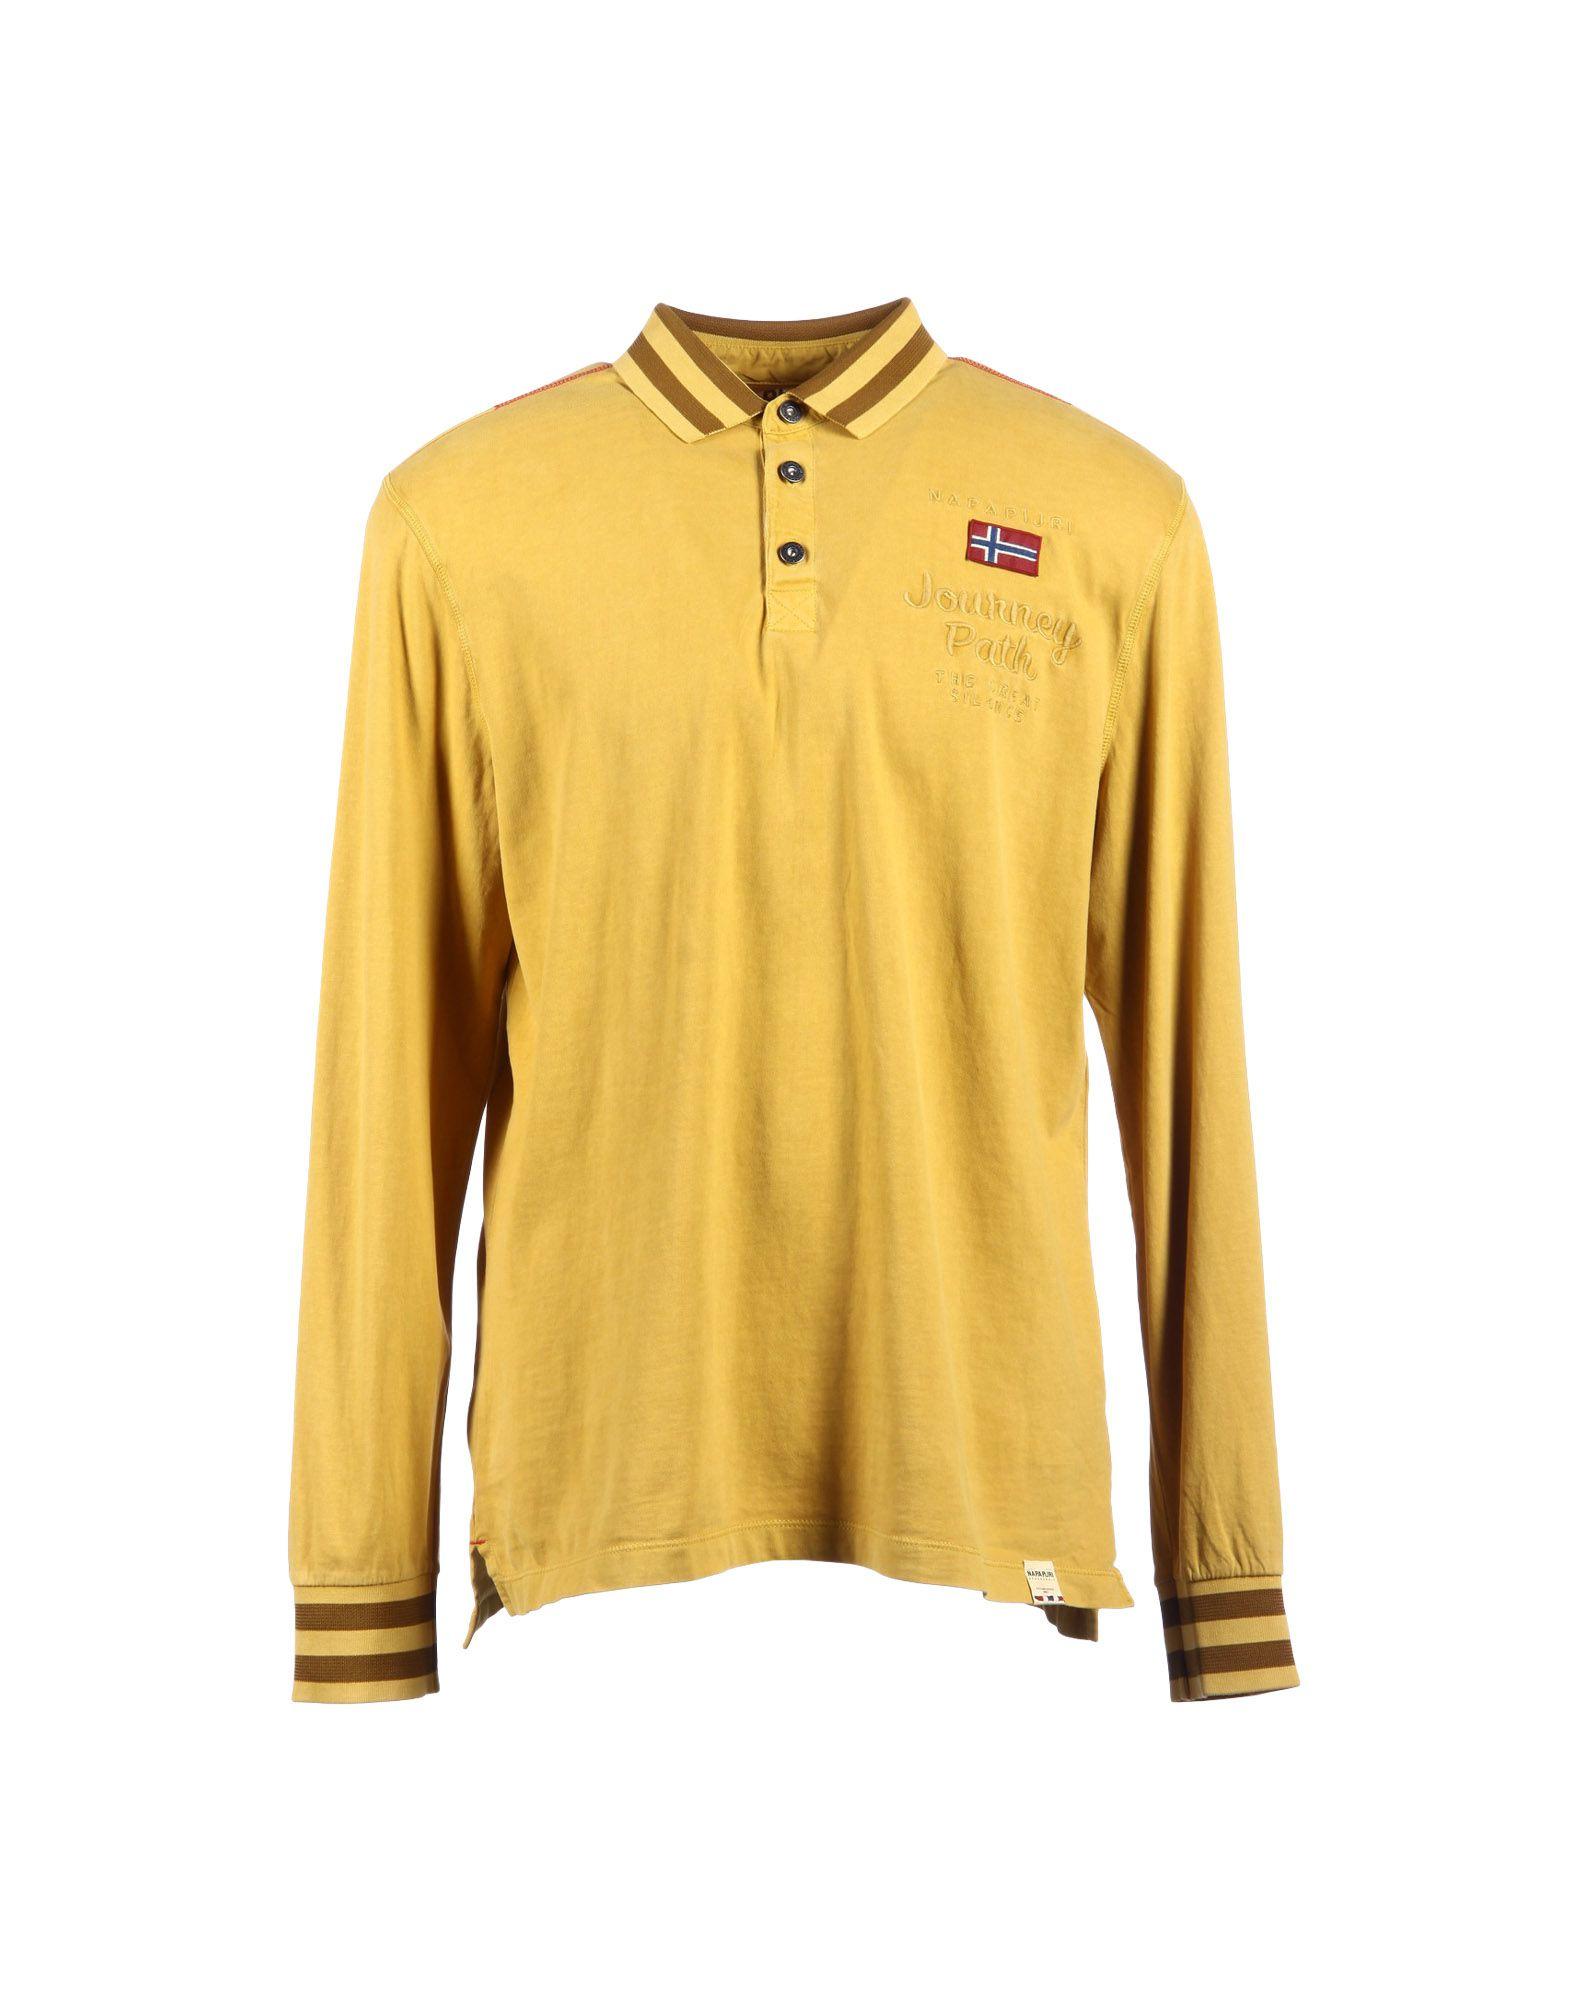 Napapijri Polo Shirt In Yellow For Men Ocher Save 42